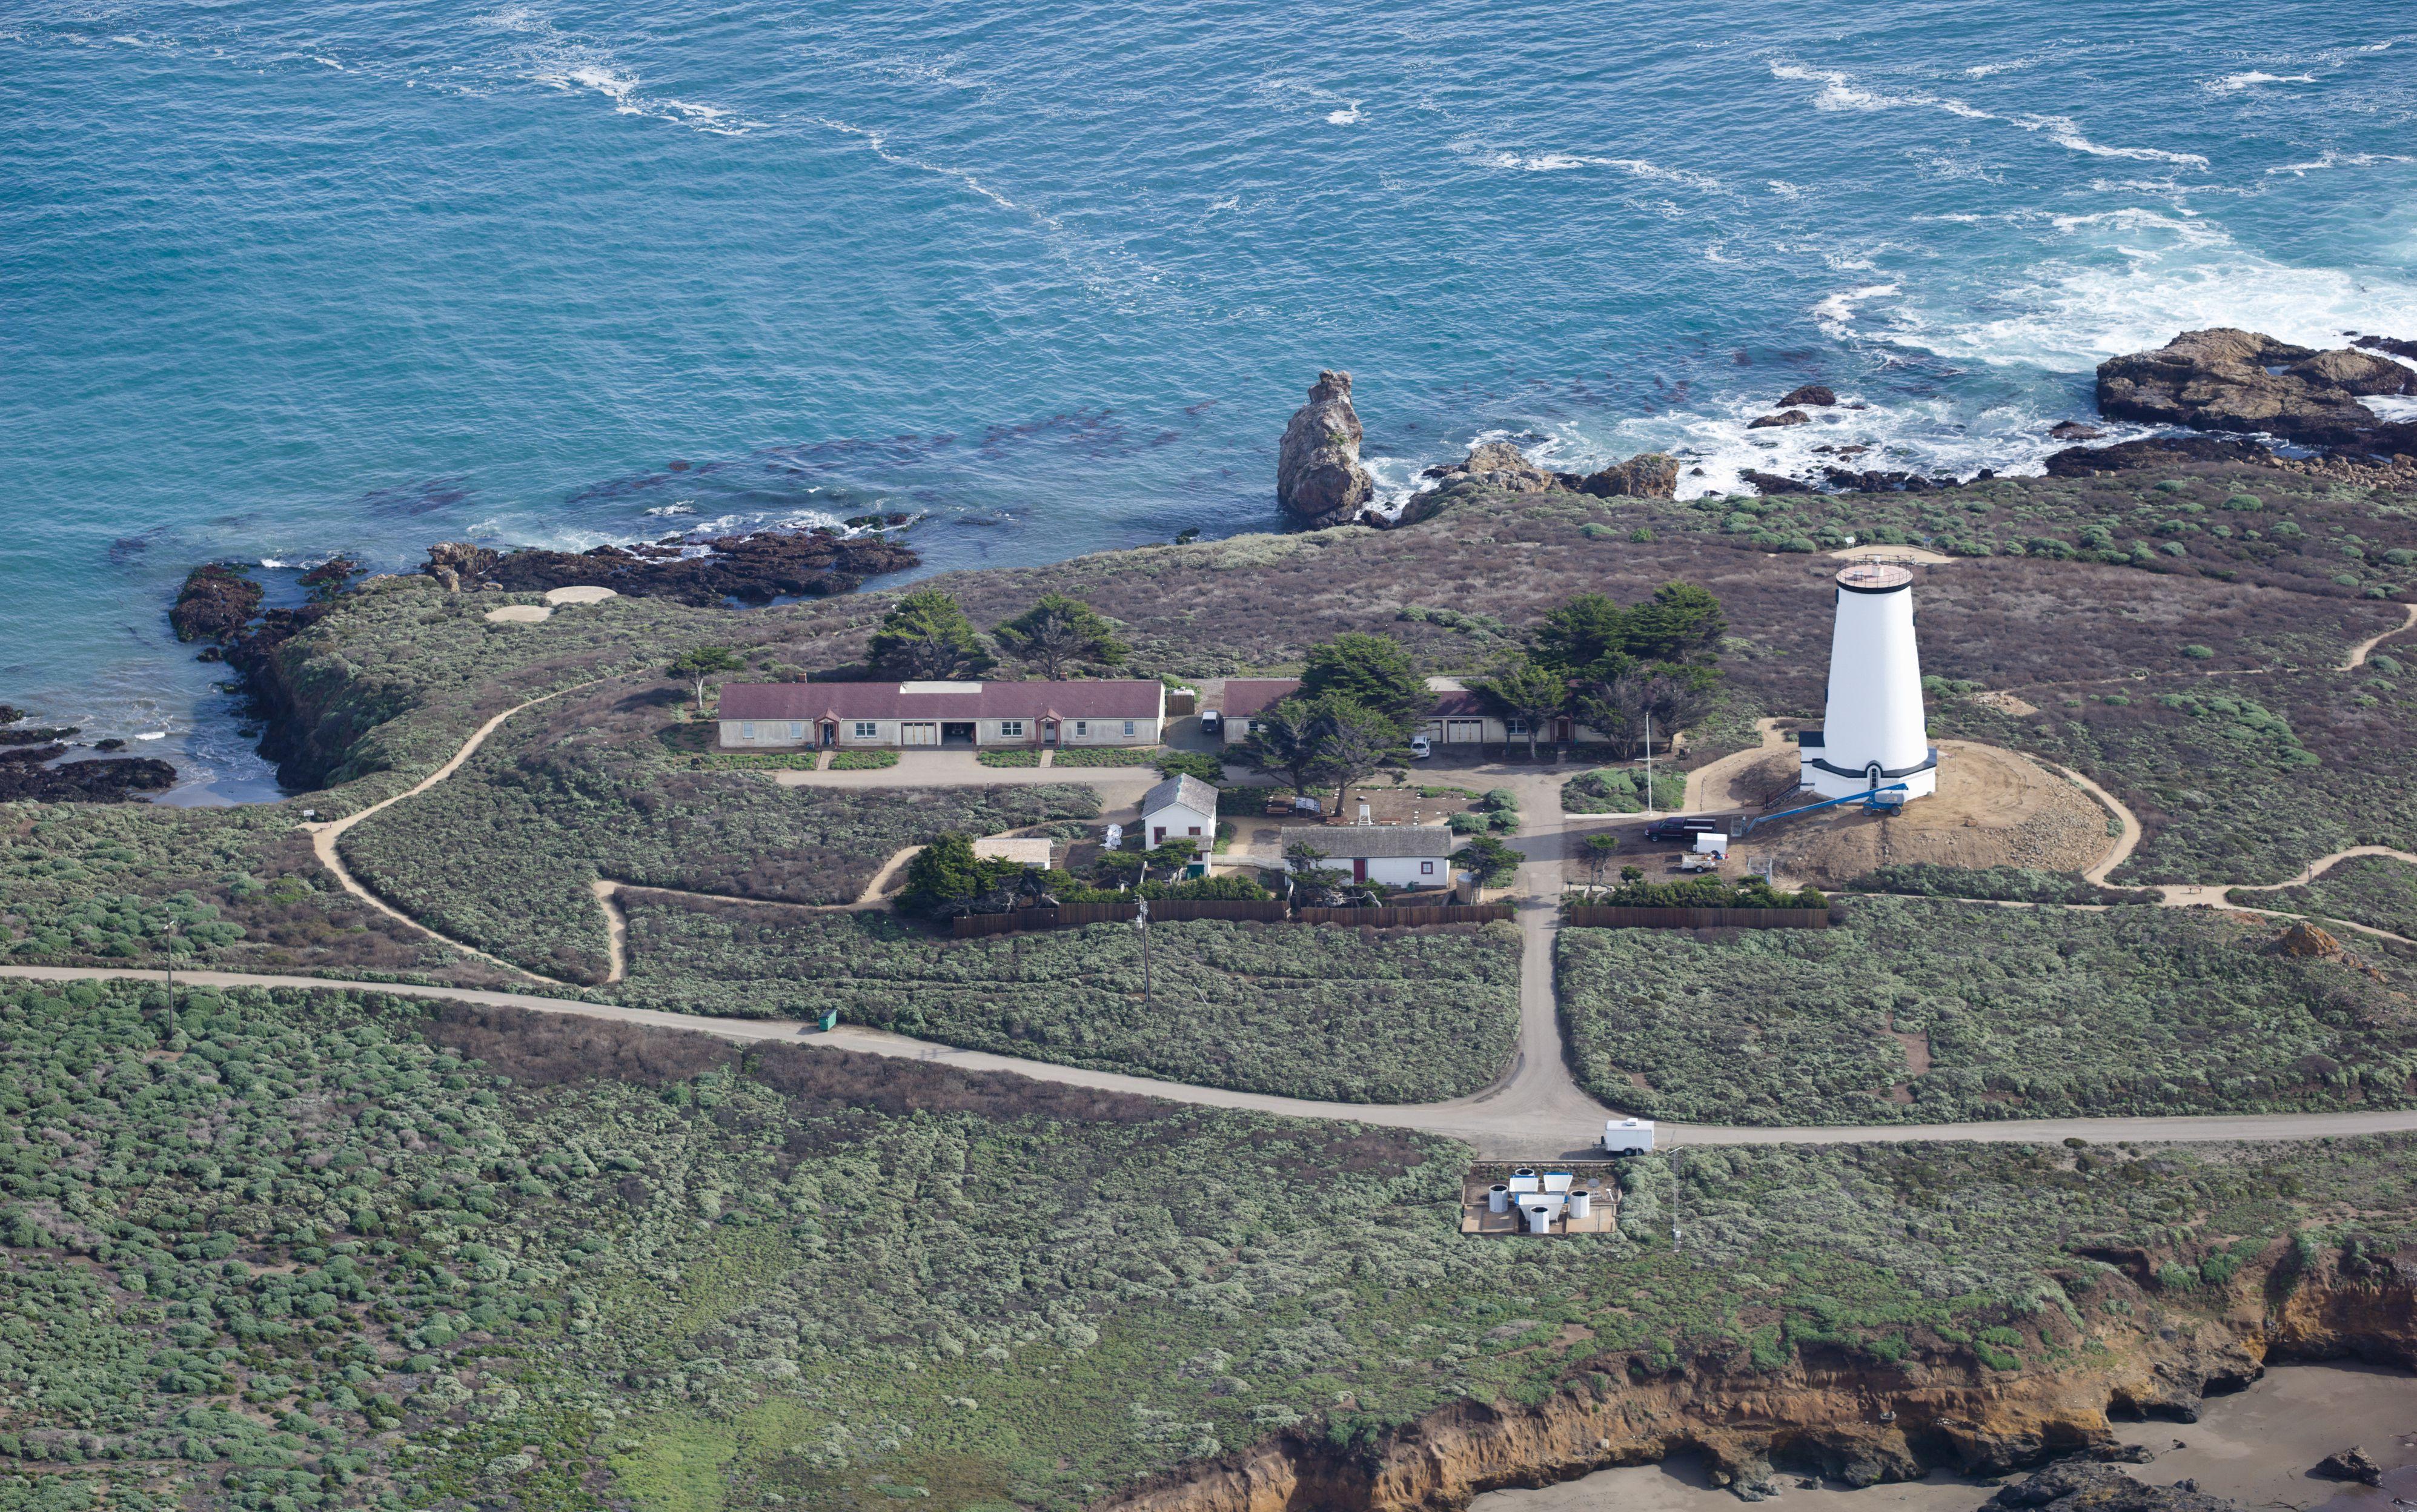 Aerial view of Piedras Blancas Lighthouse on the coast, San Luis Obispo County, California, USA